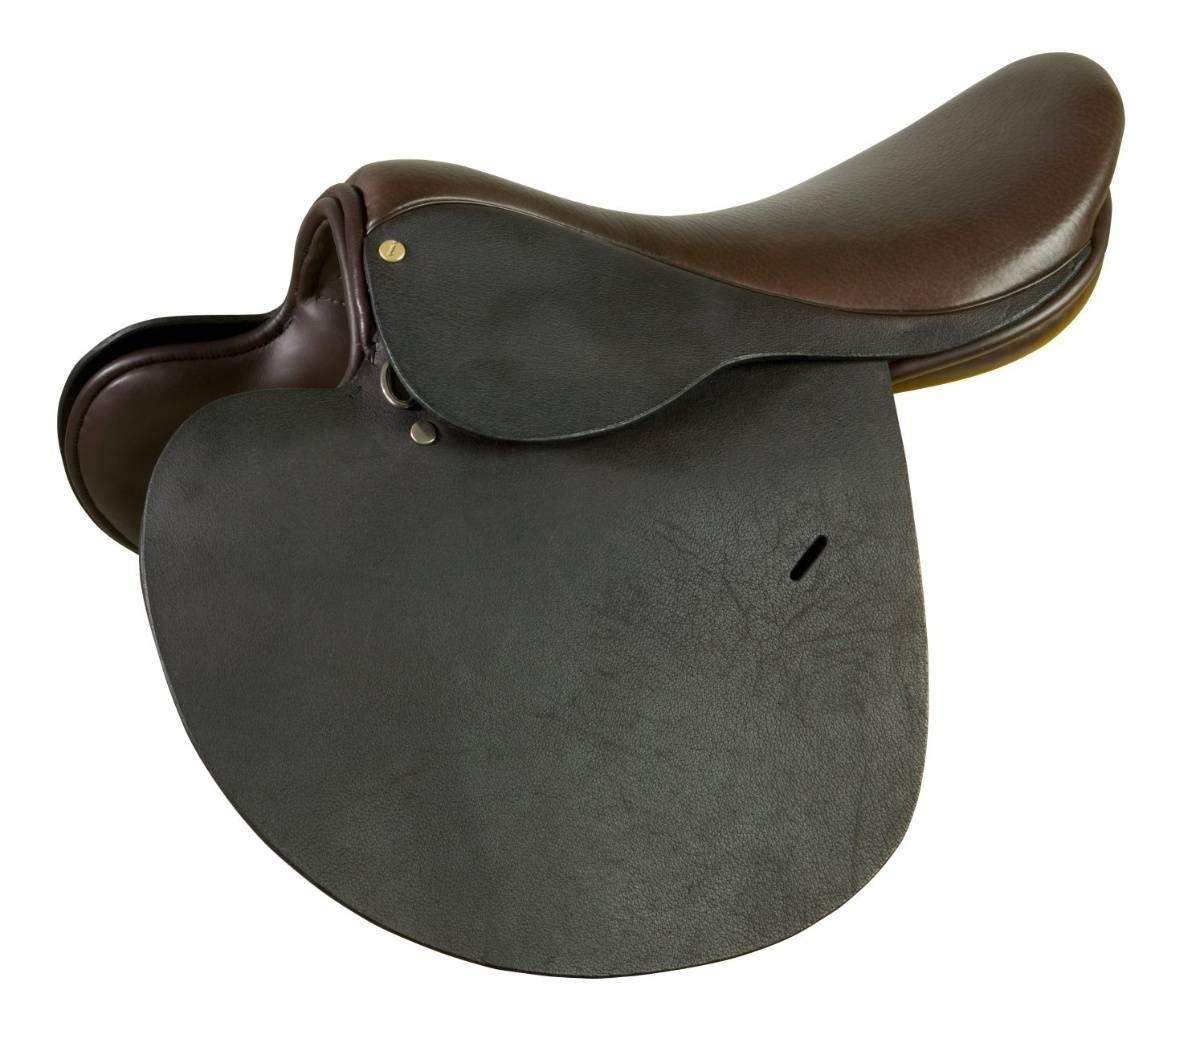 Leather Exercise Racing Horse Saddle